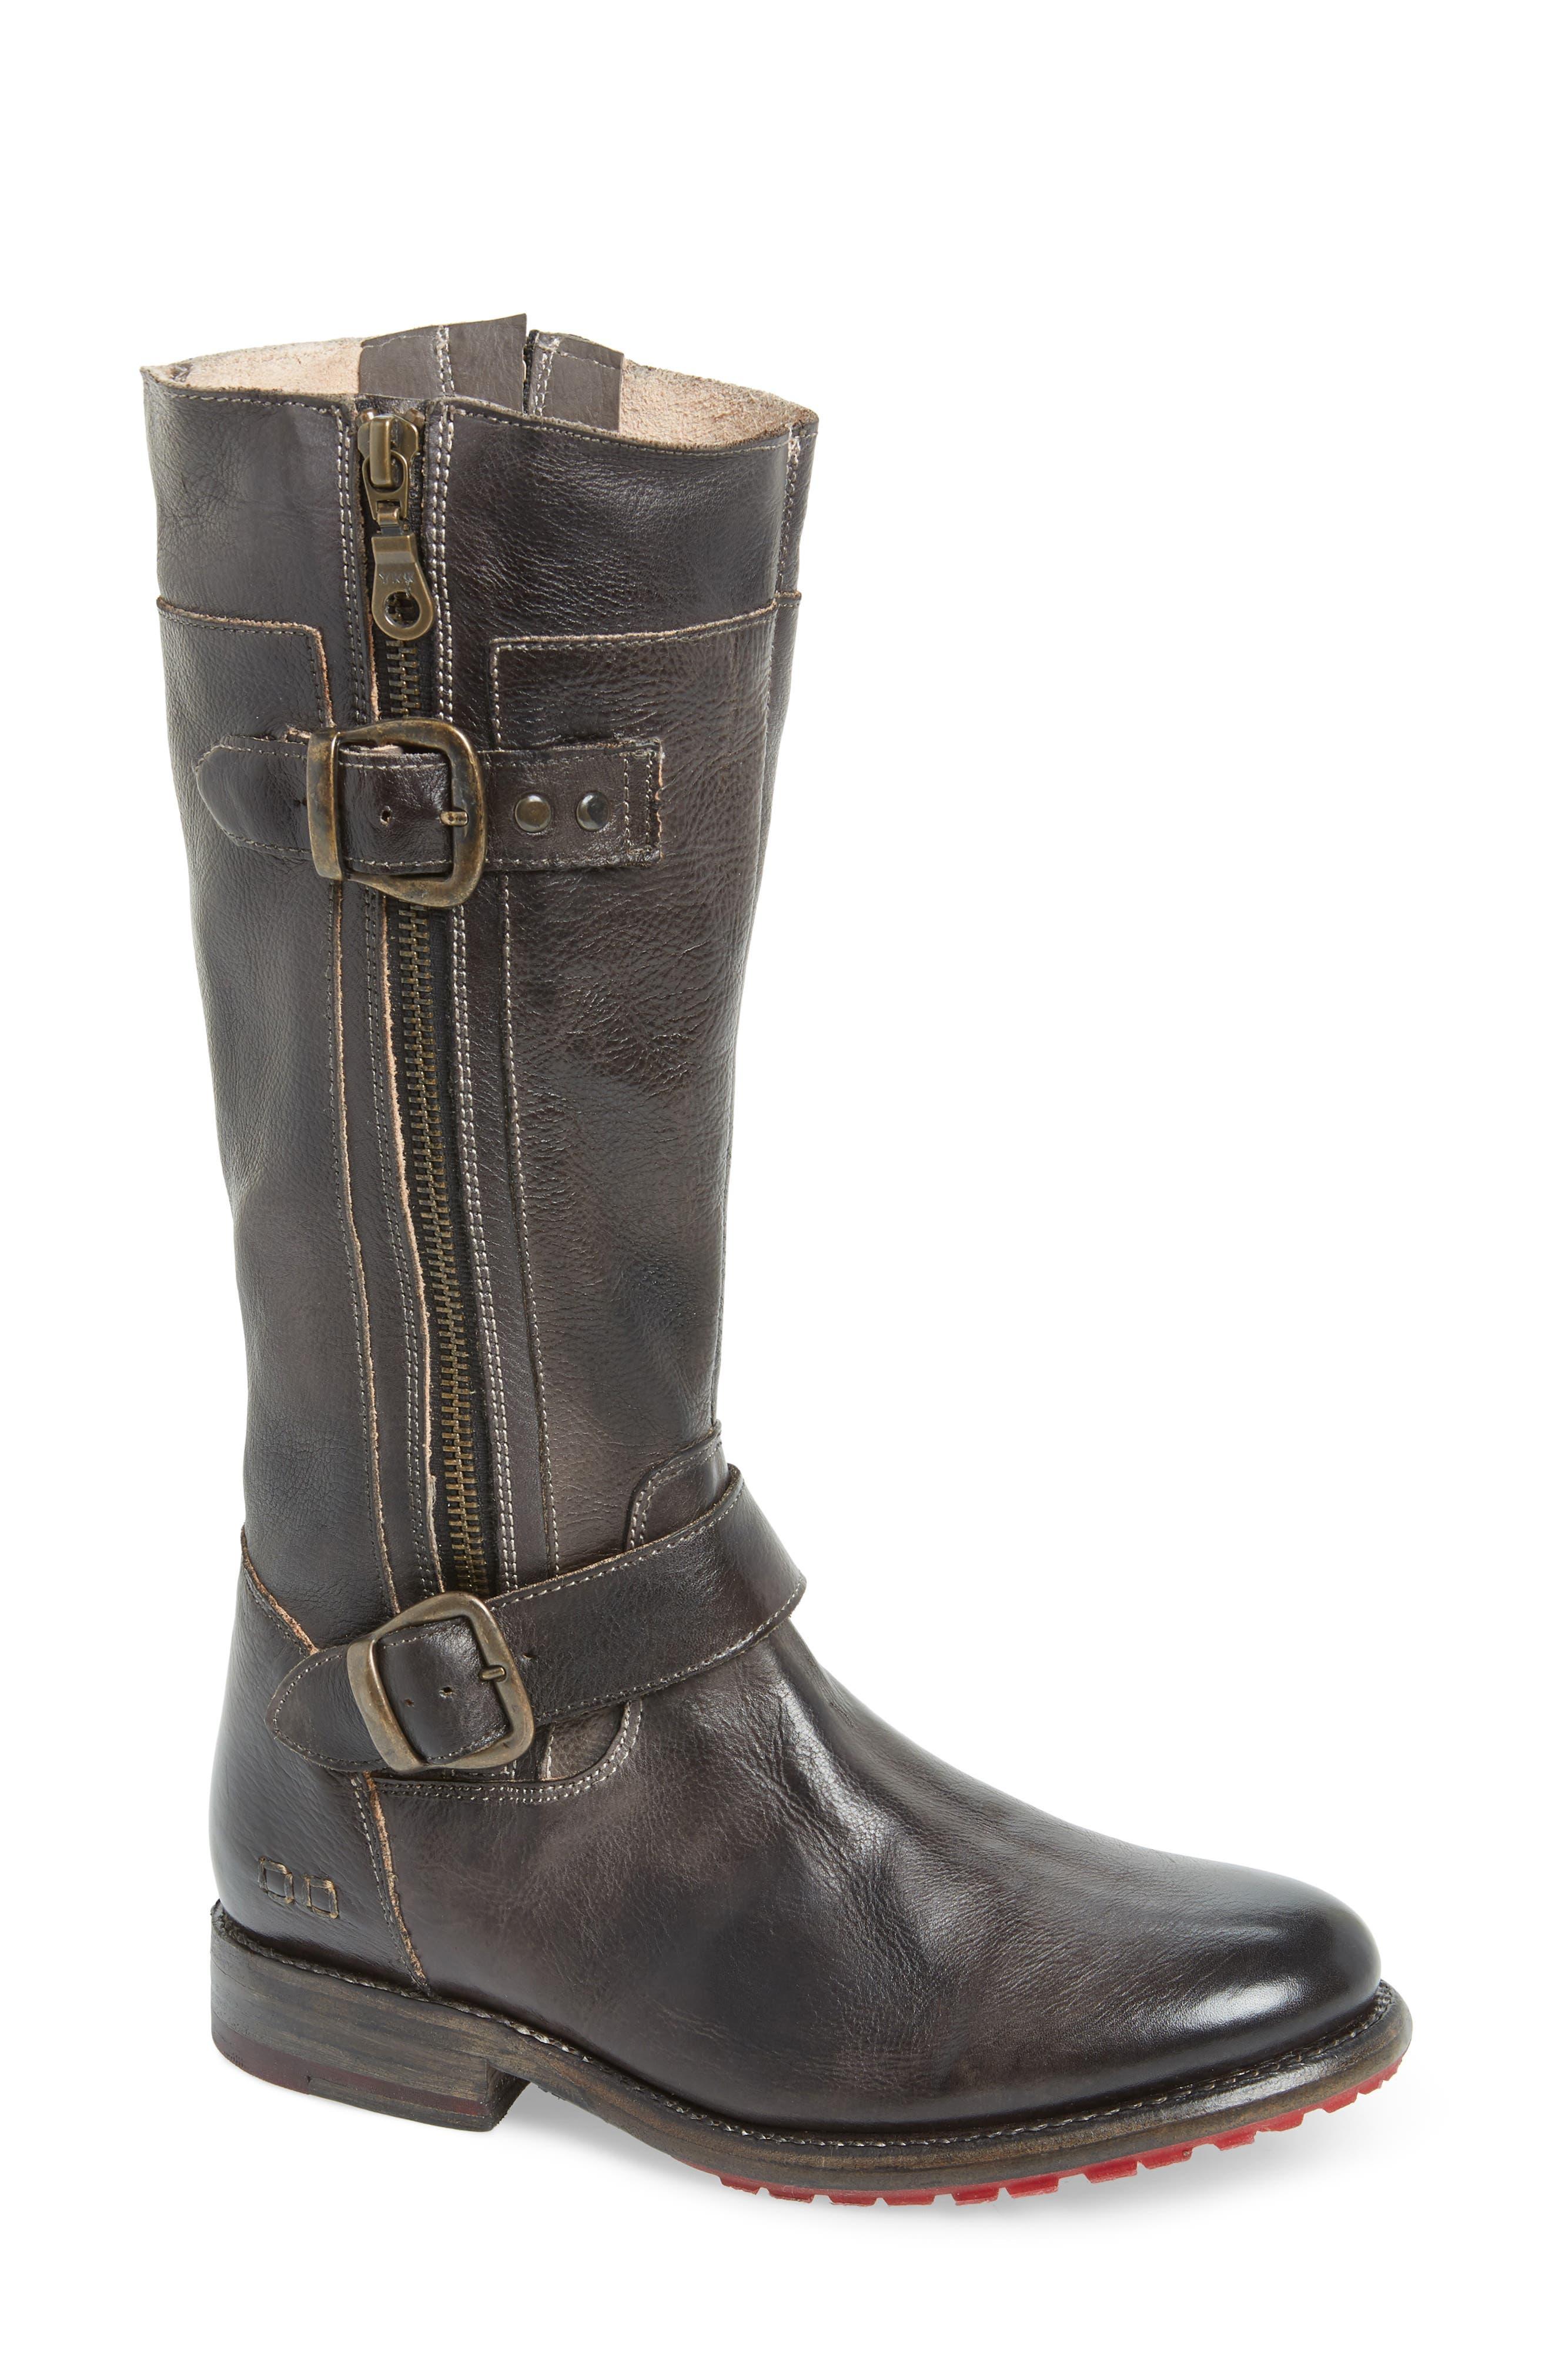 Bed Stu Gogo Boot, Black